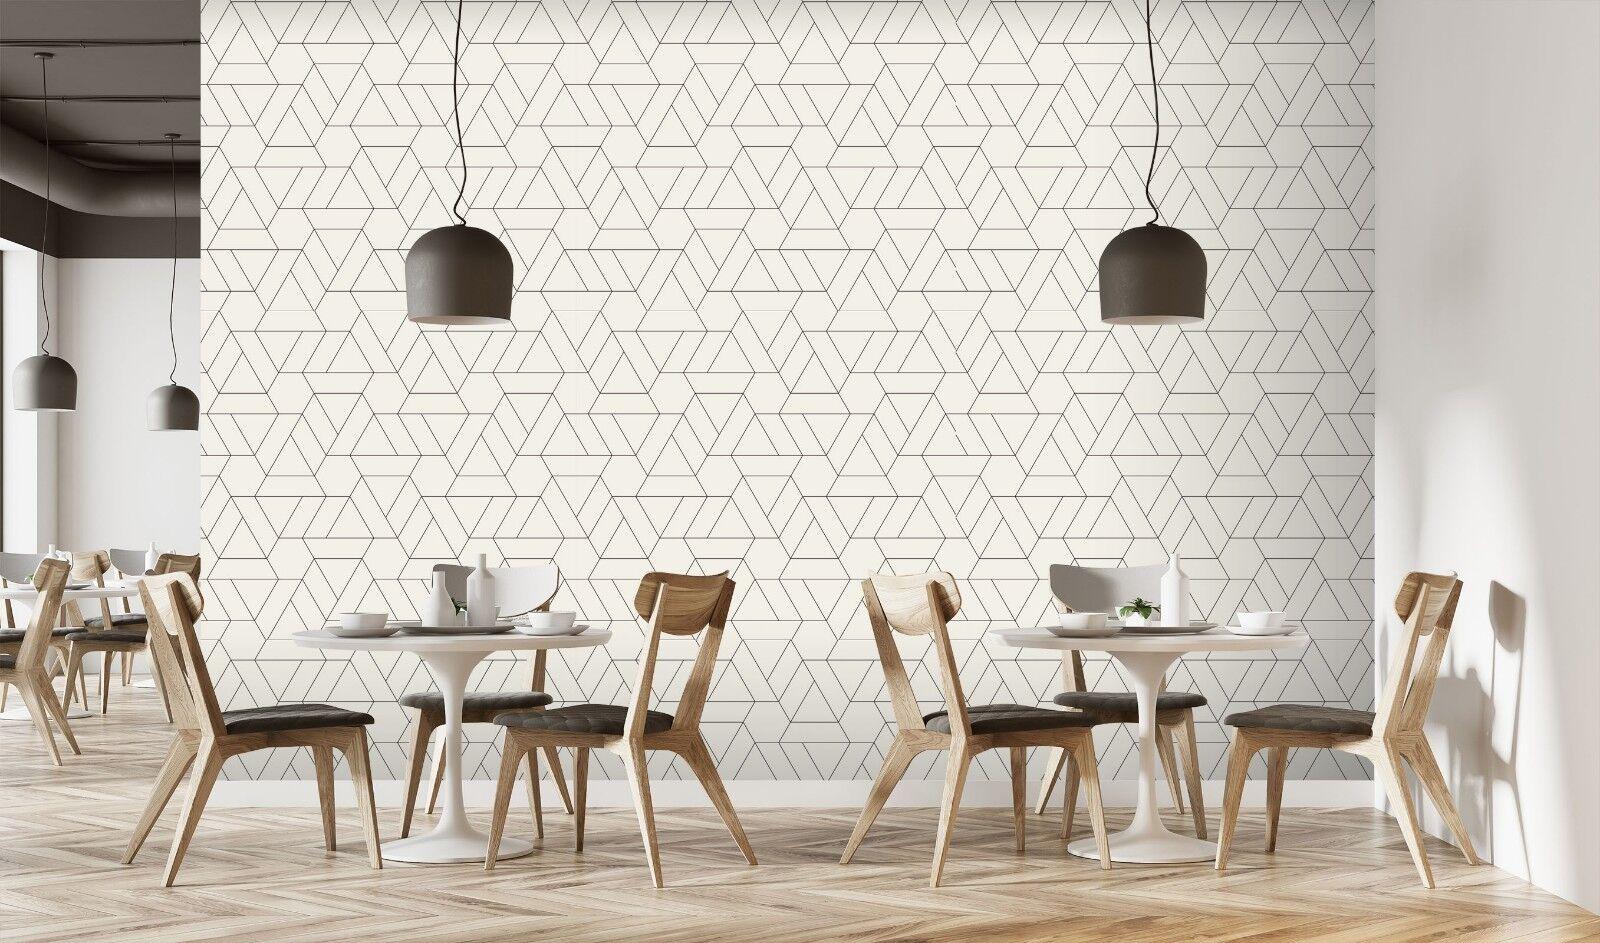 3D Overlapping Hexagon 875 Texture Tiles Marble Wall Paper Decal Wallpaper Mural